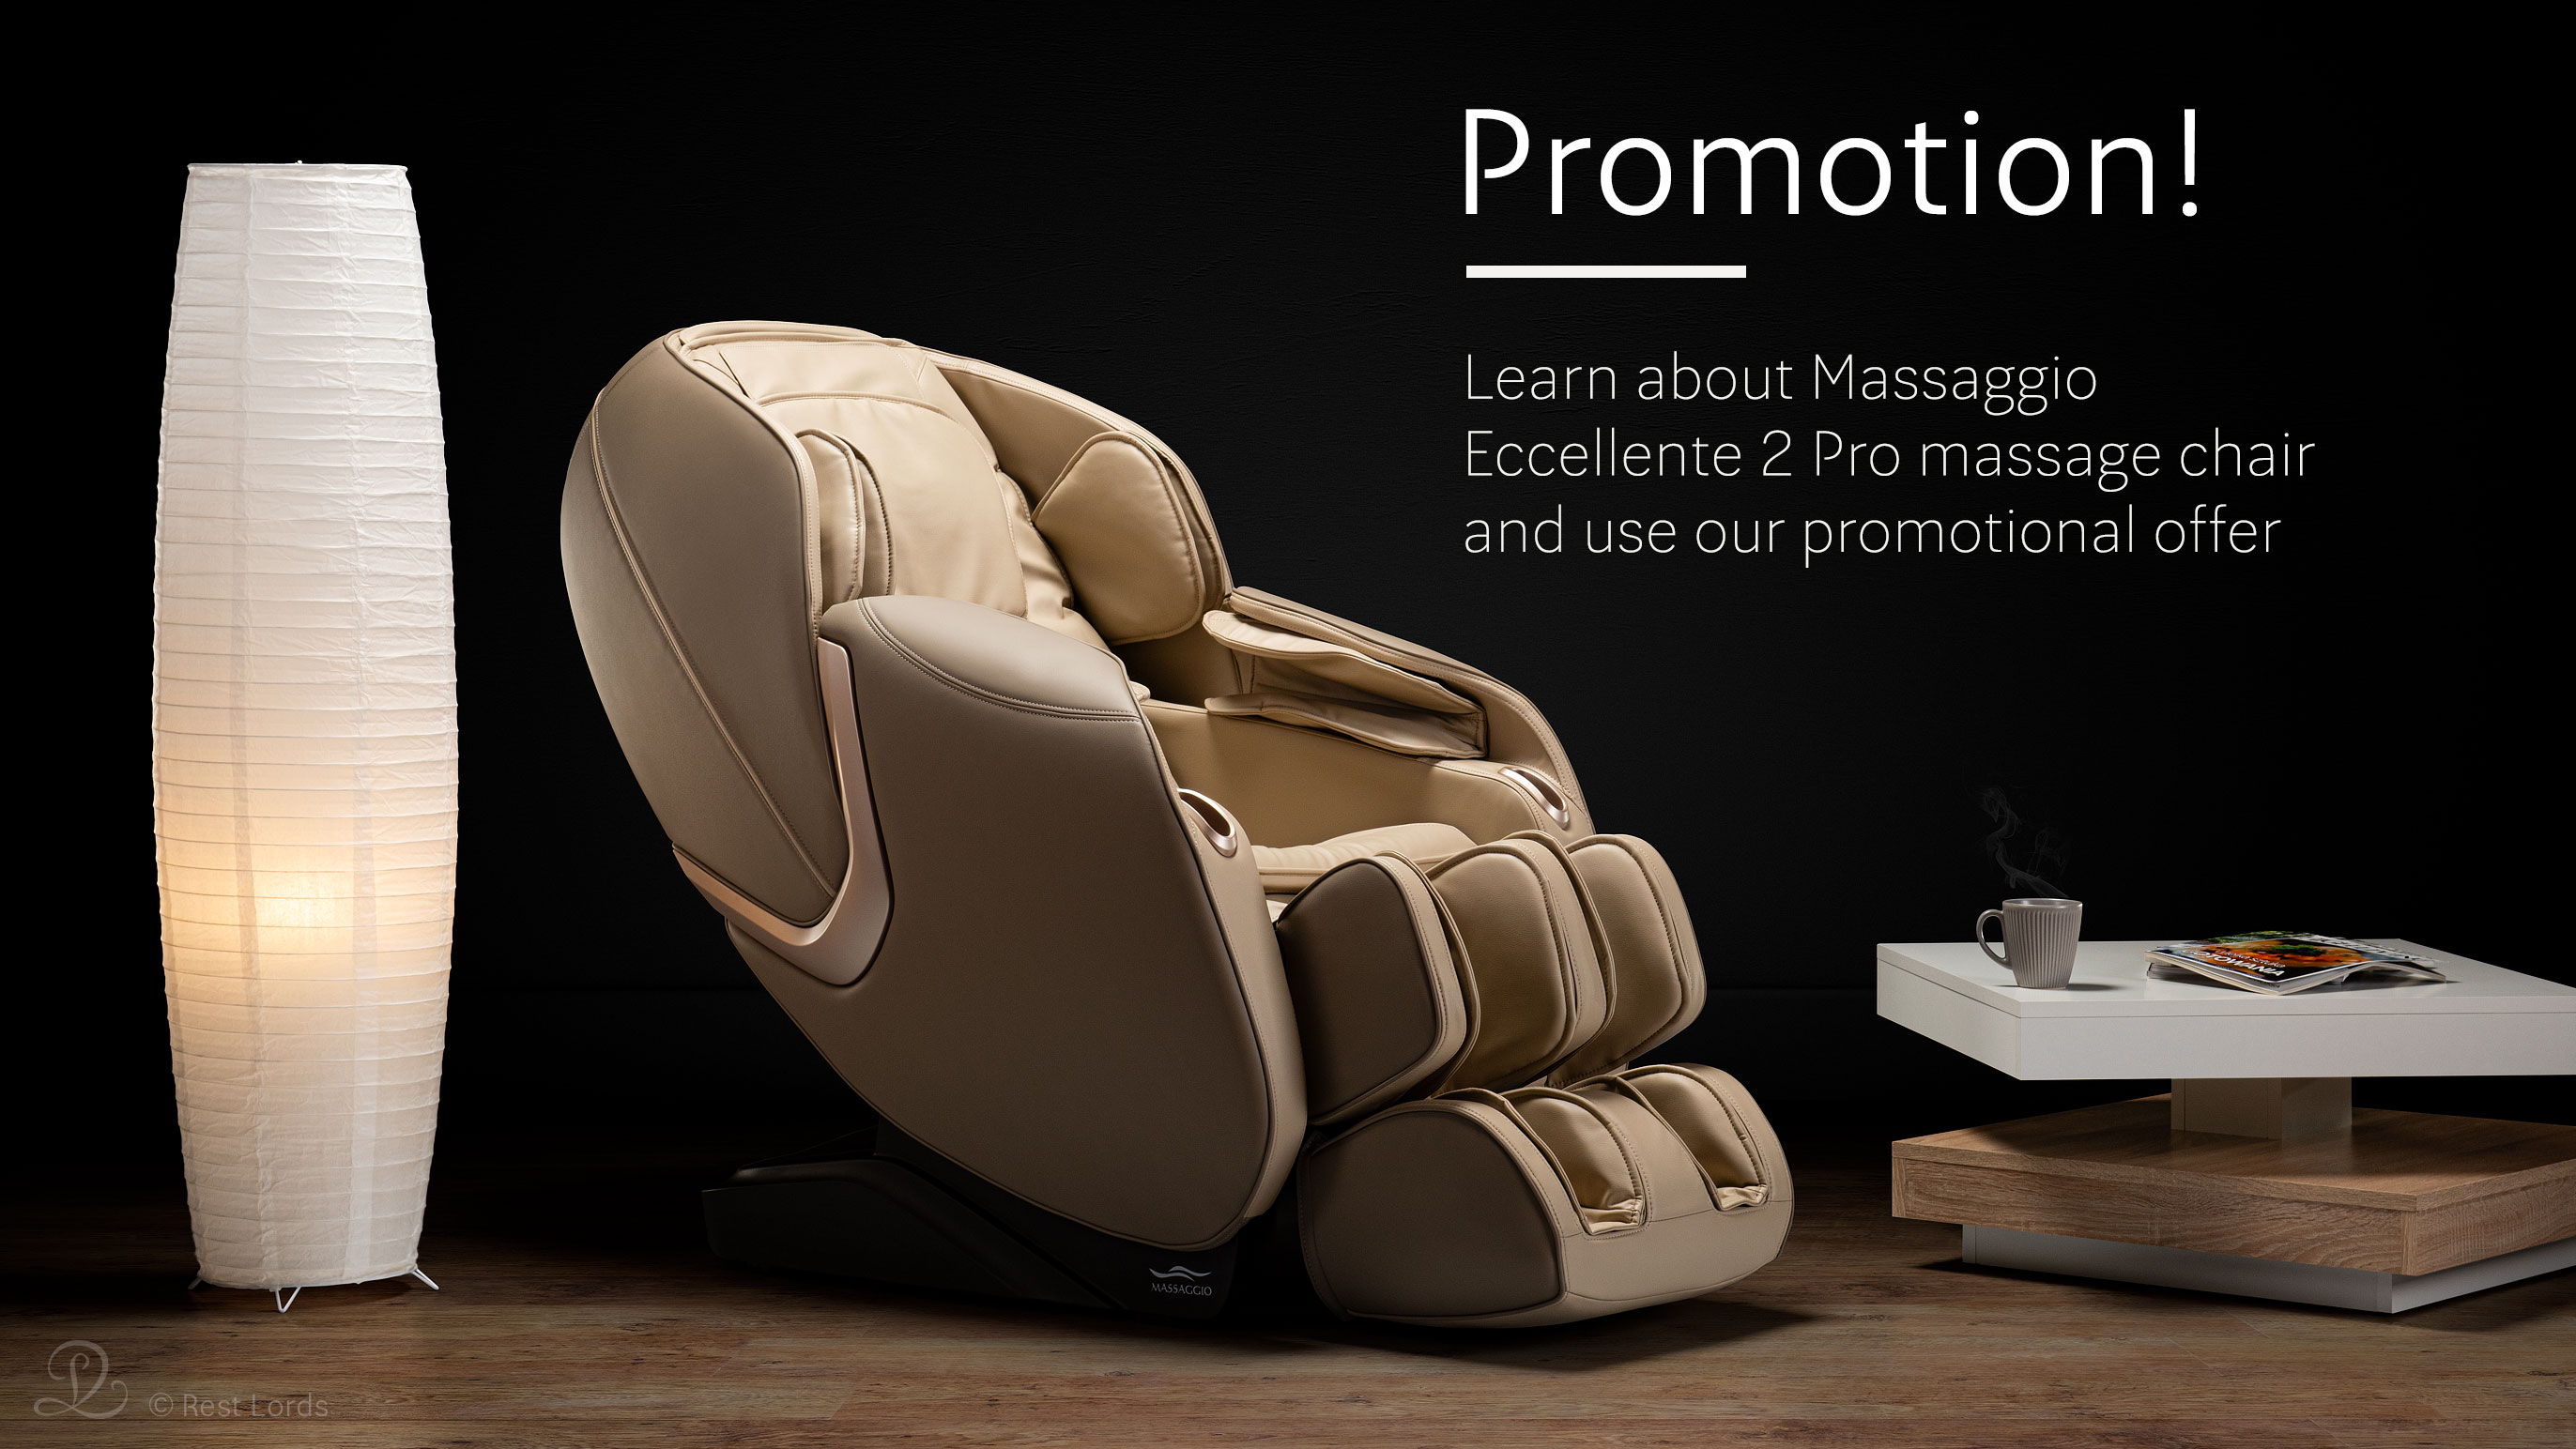 Massage chair Massaggio Eccellente 2 PRO on sale promotion